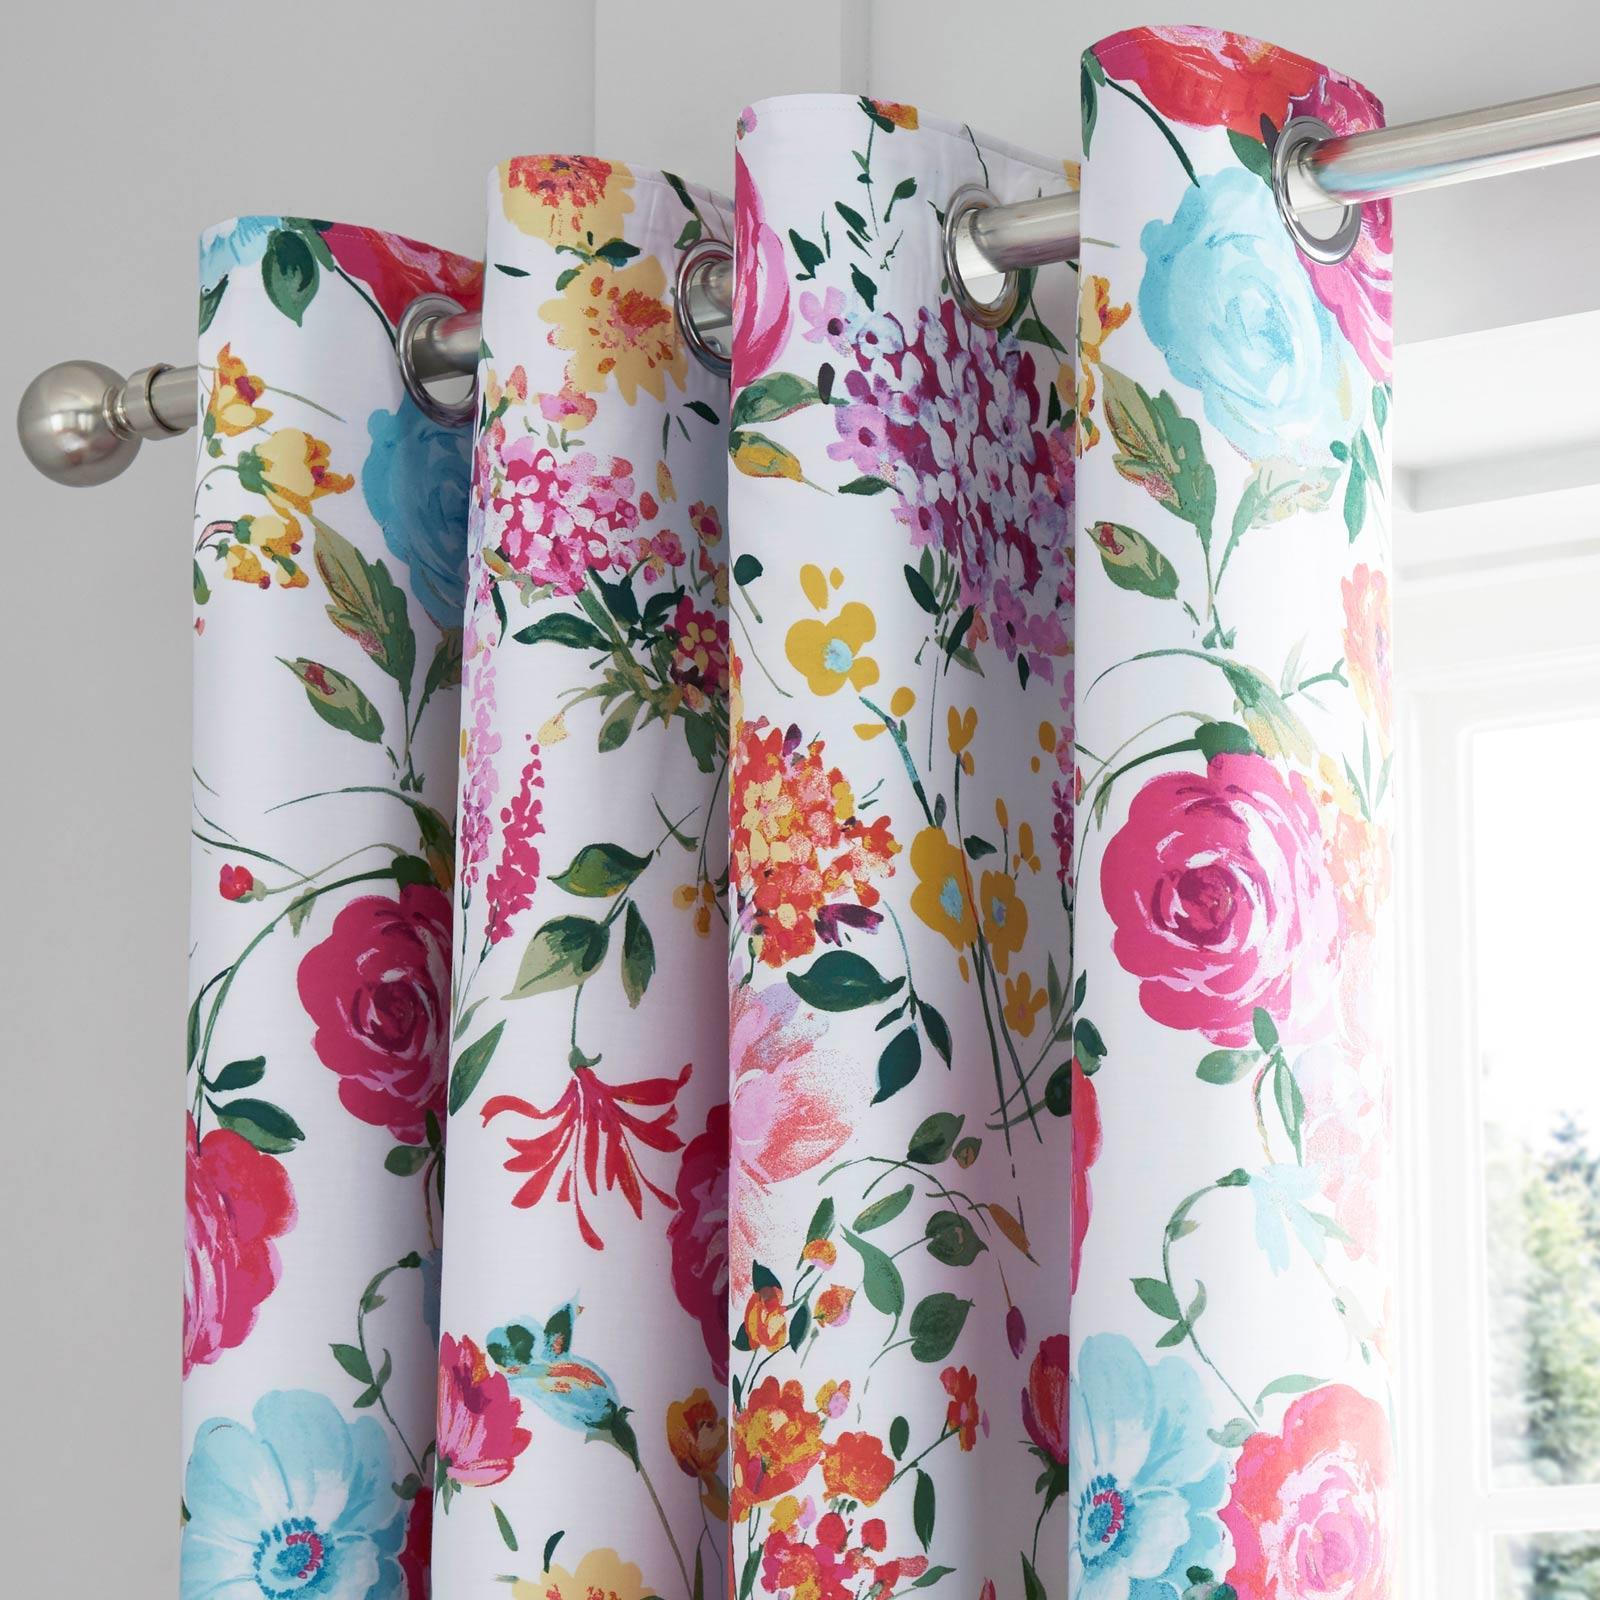 Catherine-Lansfield-Salisbury-Pink-cubierta-del-edredon-edredon-cubre-floral-de-conjuntos-de-cama miniatura 24